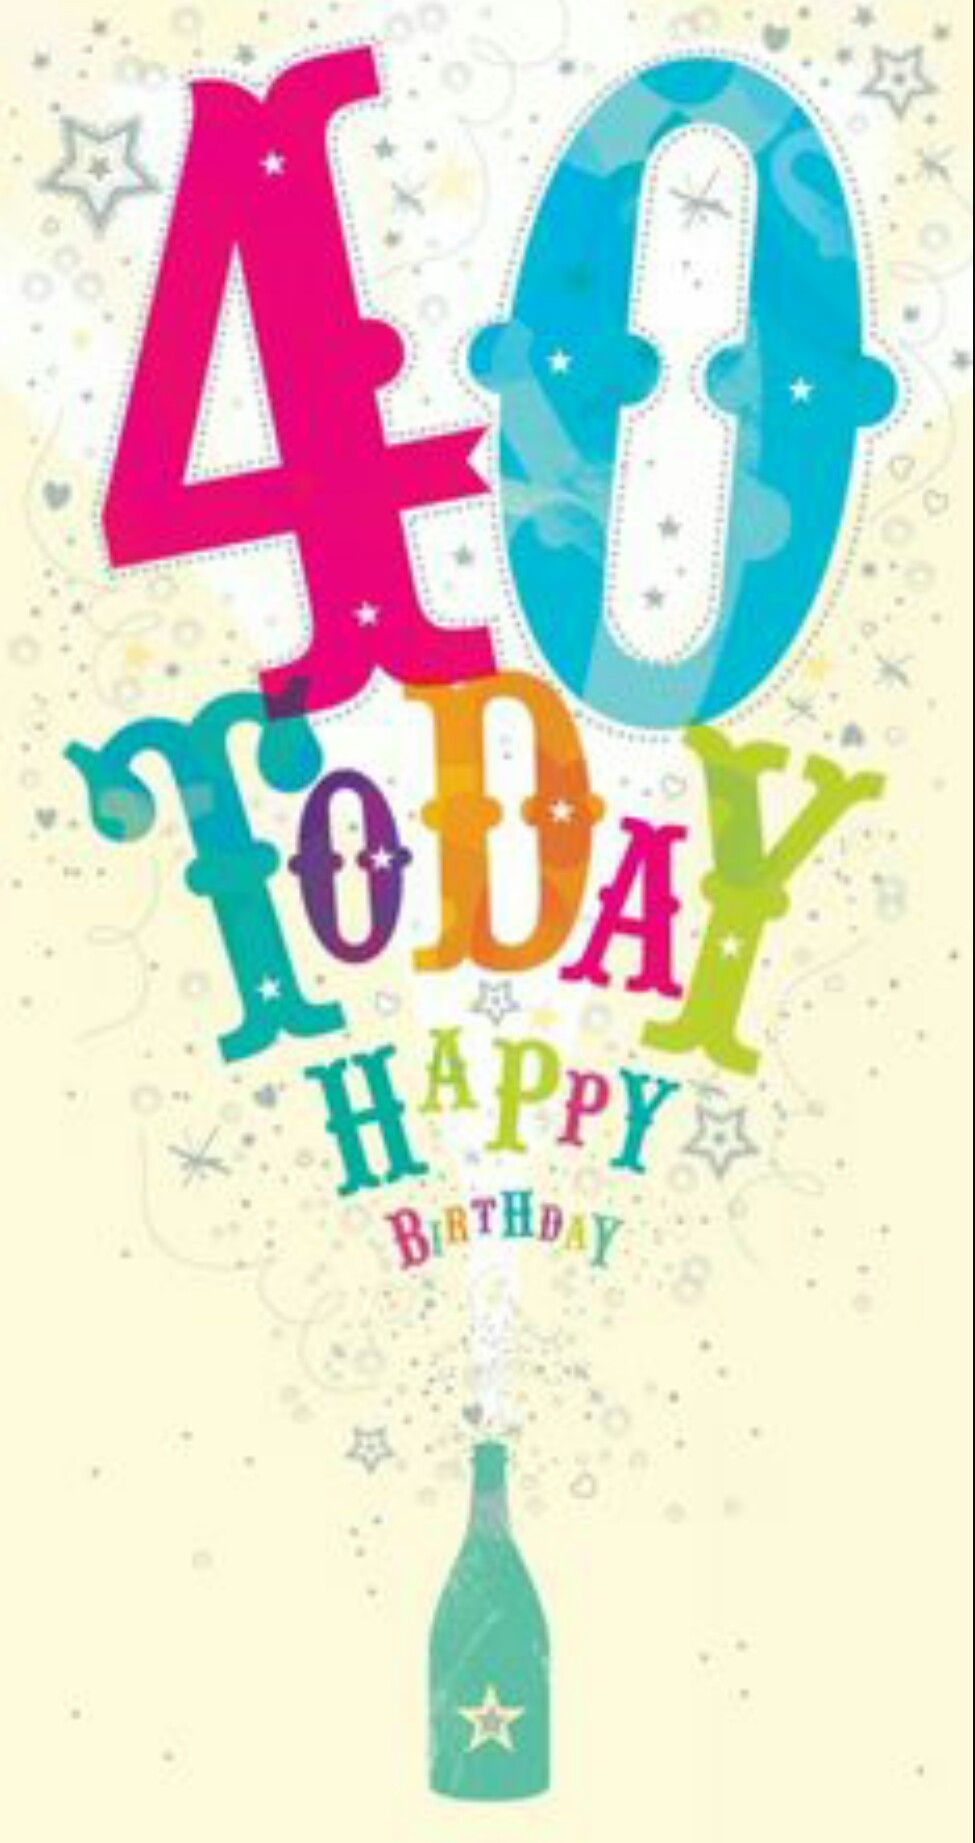 Pin by Jigyasa Arora on Happy birthday 40th birthday